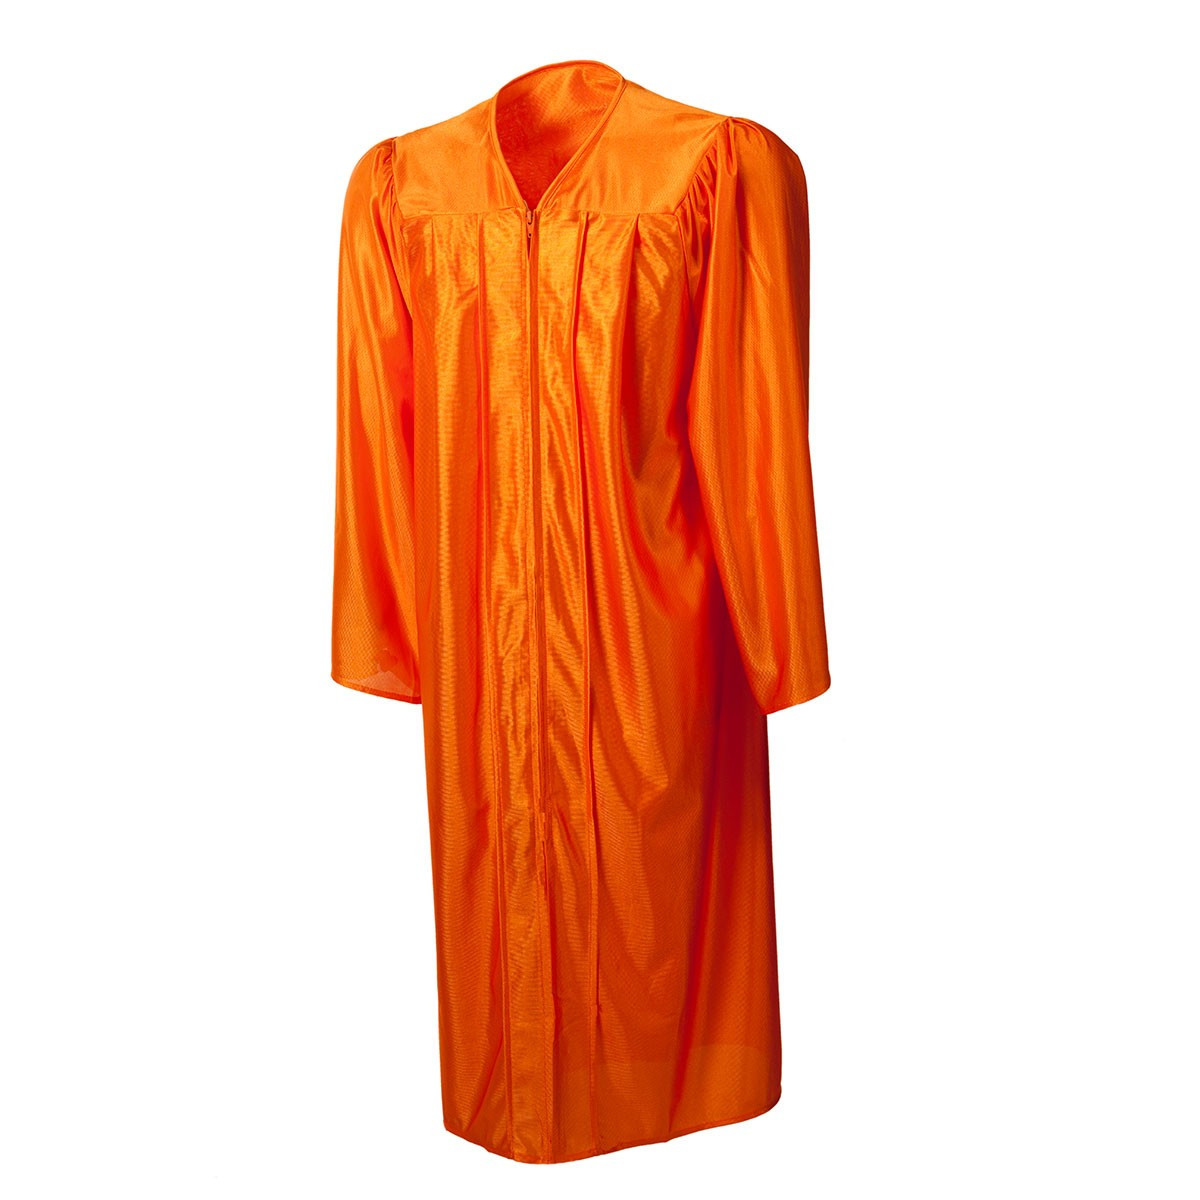 Shiny Orange Cap, Gown & Tassel - Cool School Studios